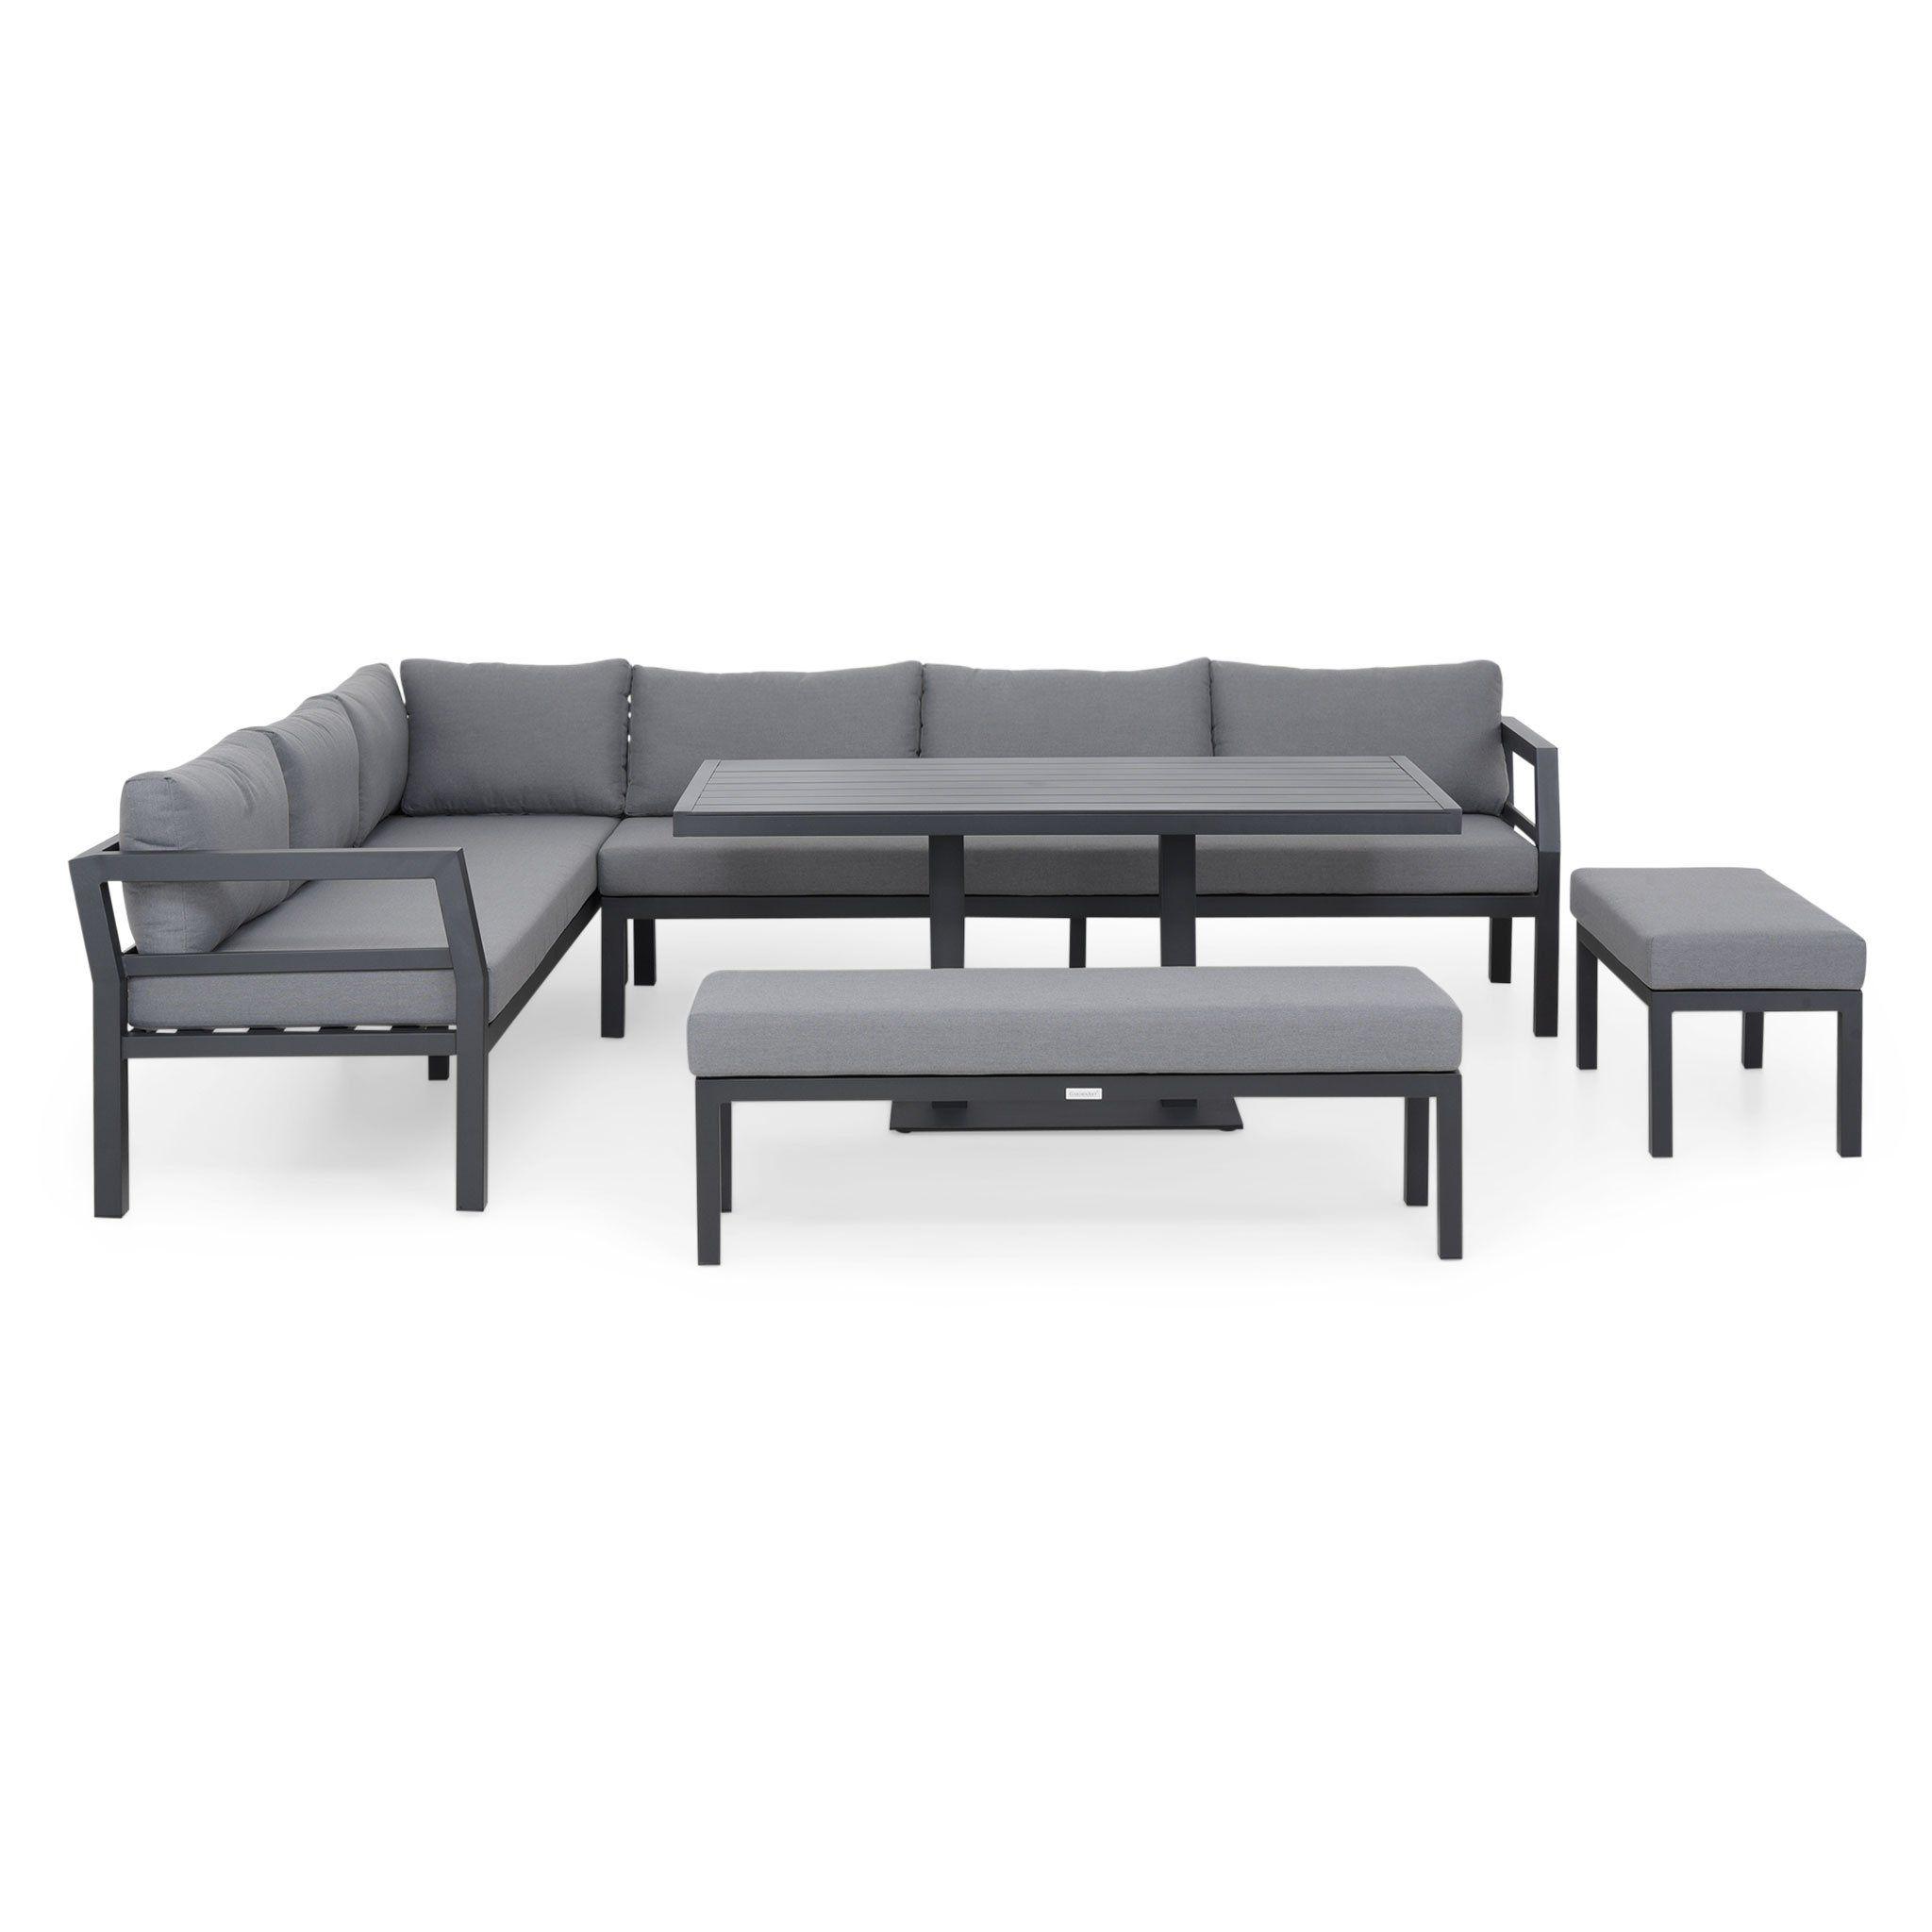 Bondi Set Mobilier Gradina Terasa Coltar 5 Piese In 2020 Coffee Table Home Decor Furniture